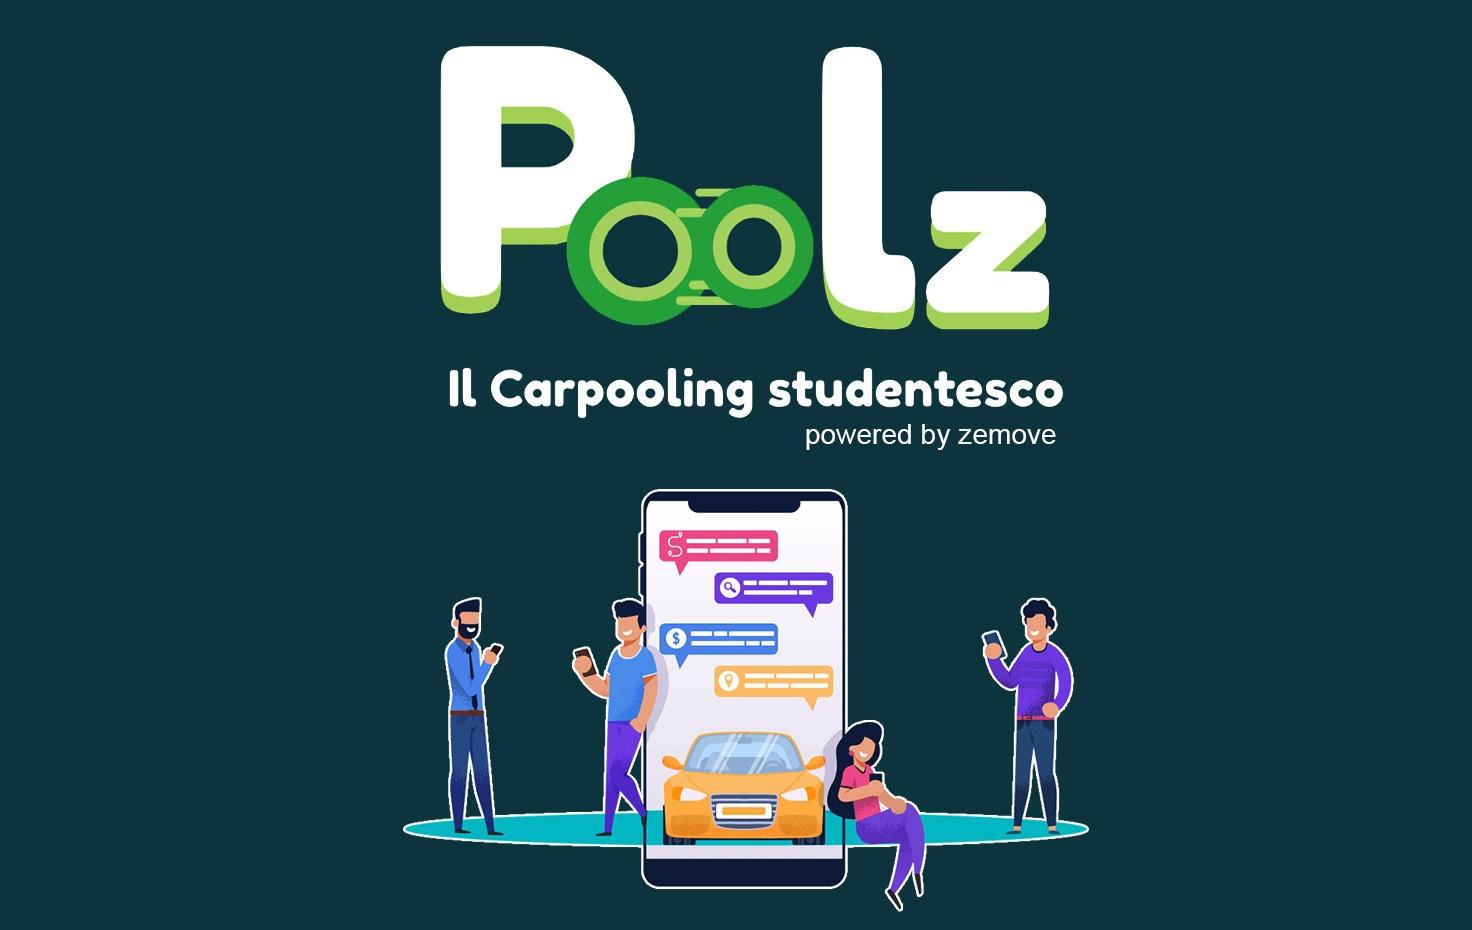 PoolZ in raccolta fondi su Eppela